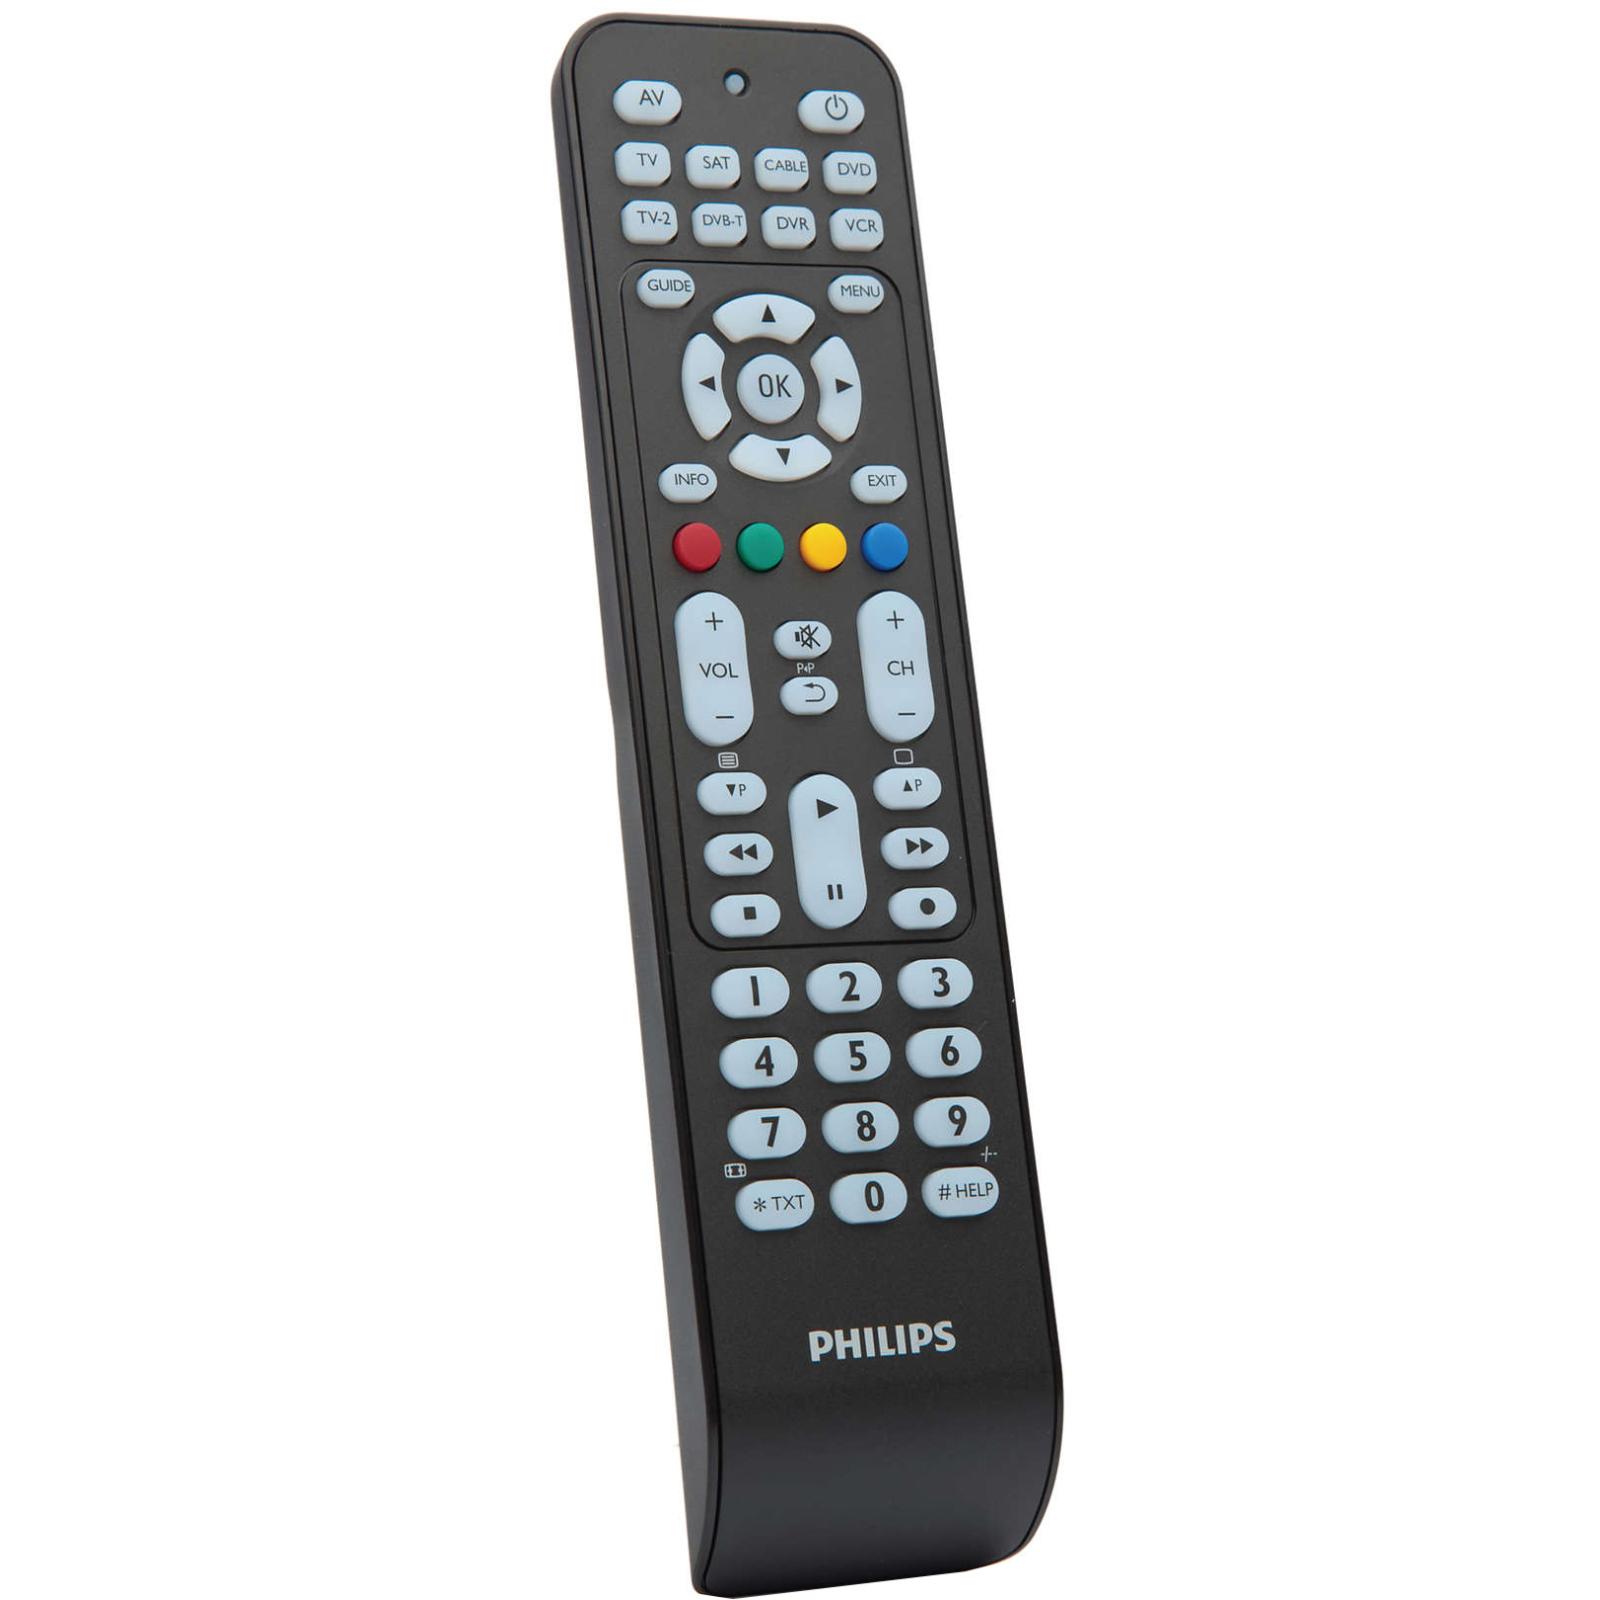 Пульт ДУ для телевизора PHILIPS SRP2008B (SRP2008B/86) изображение 2